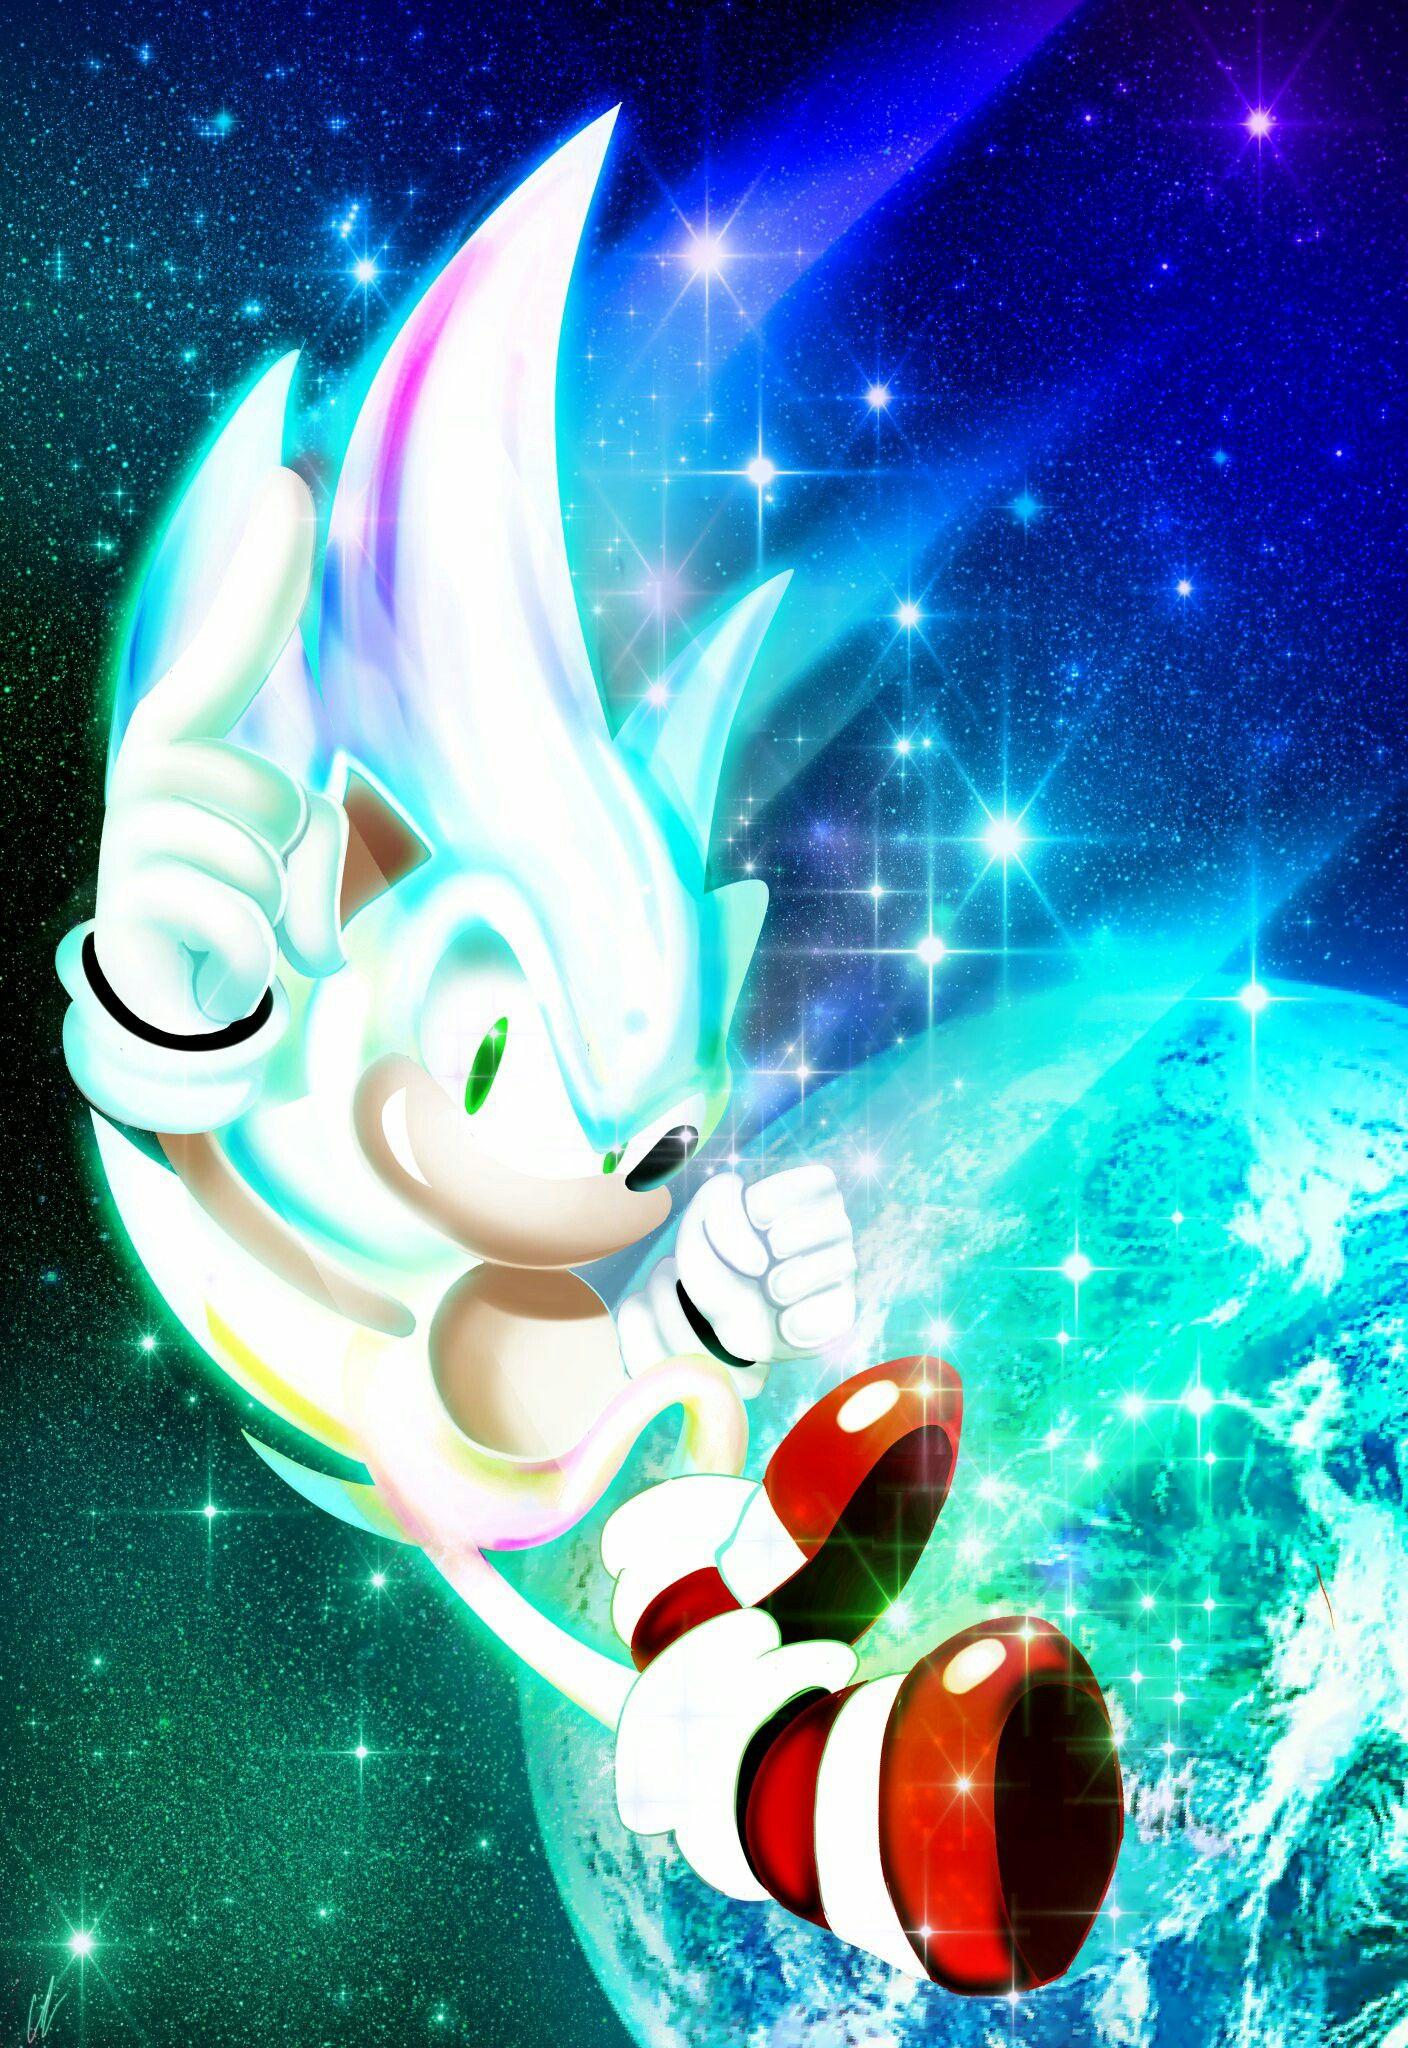 Aeroartwork On Videojuegos Wallpaper Sonic The Hedgehog Y